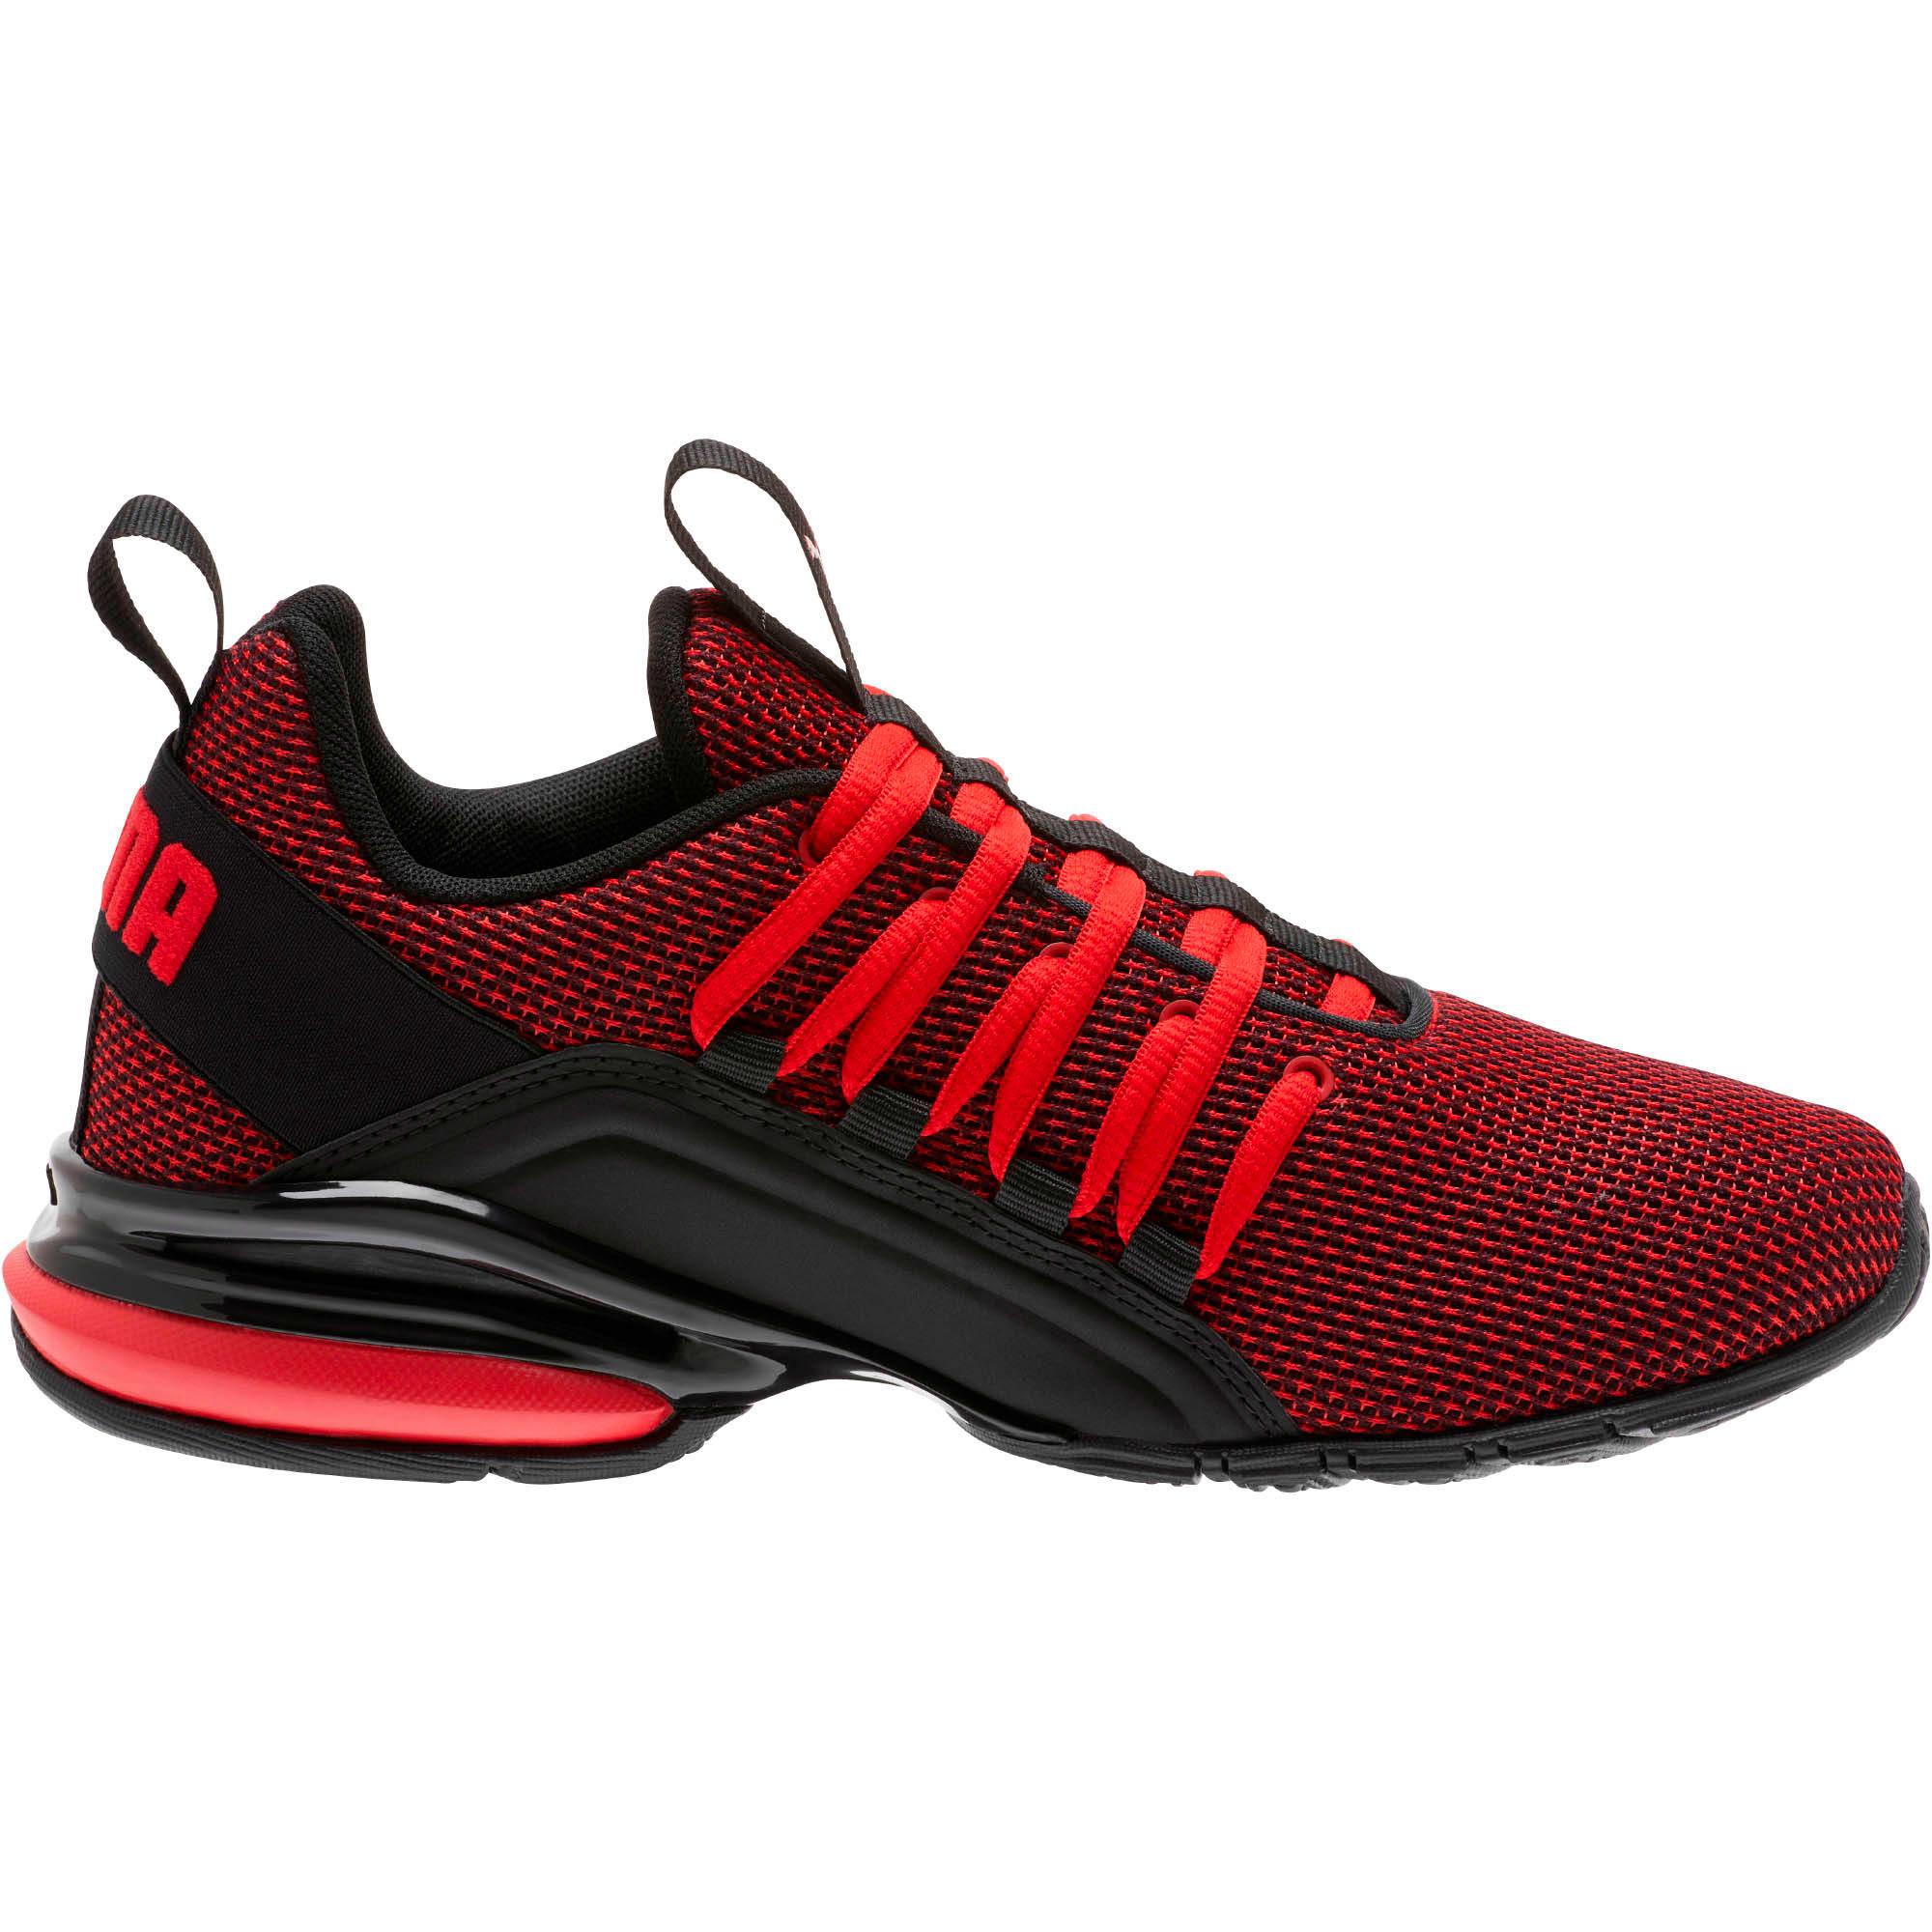 Thumbnail 4 of Axelion NM Training Shoes JR, High Risk Red-Puma Black, medium